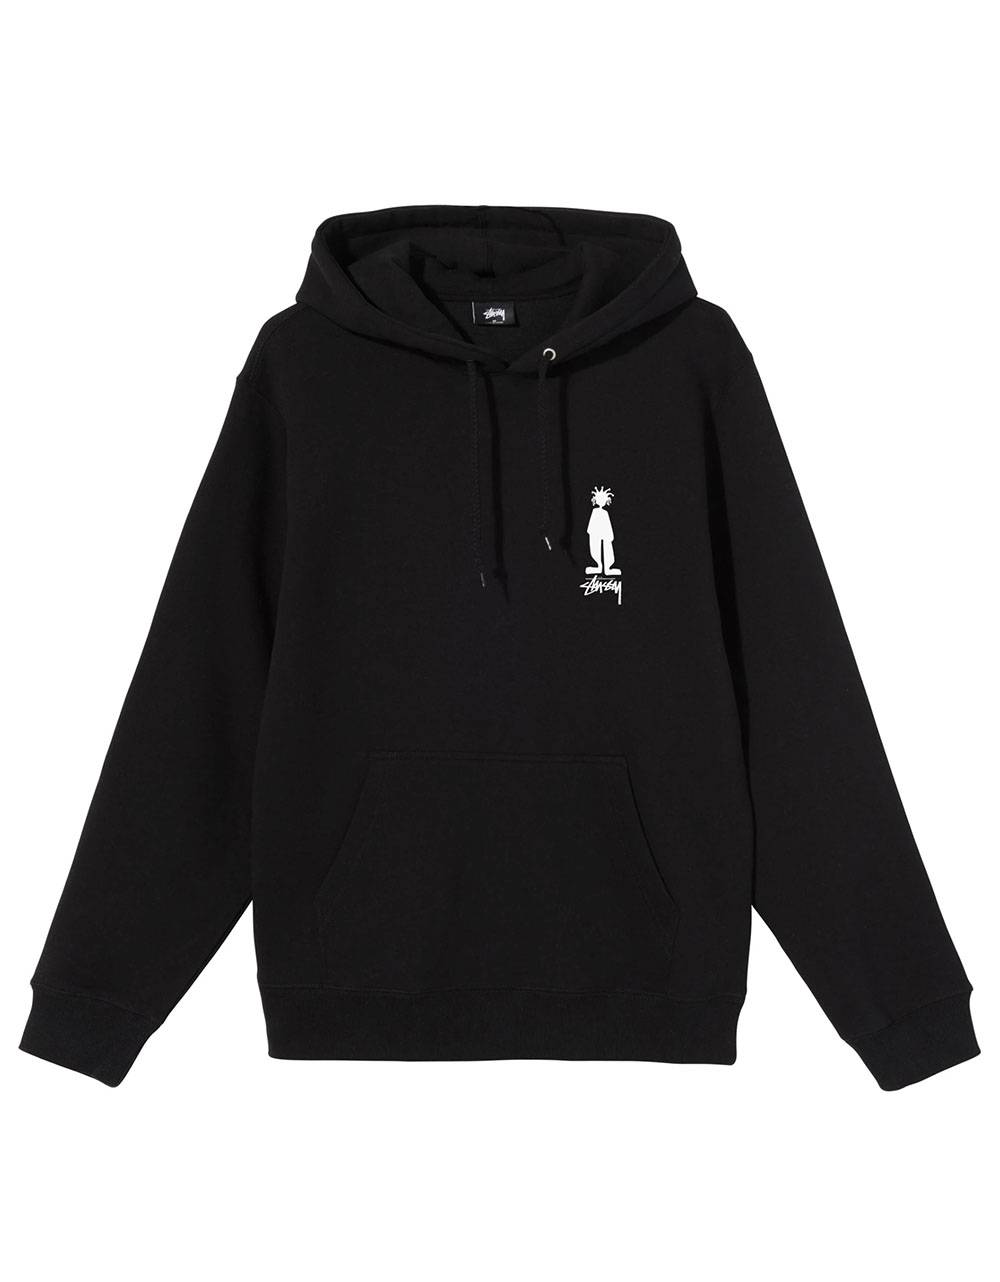 Stussy king raggamuffin hoodie - black Stussy Sweater 119,00€